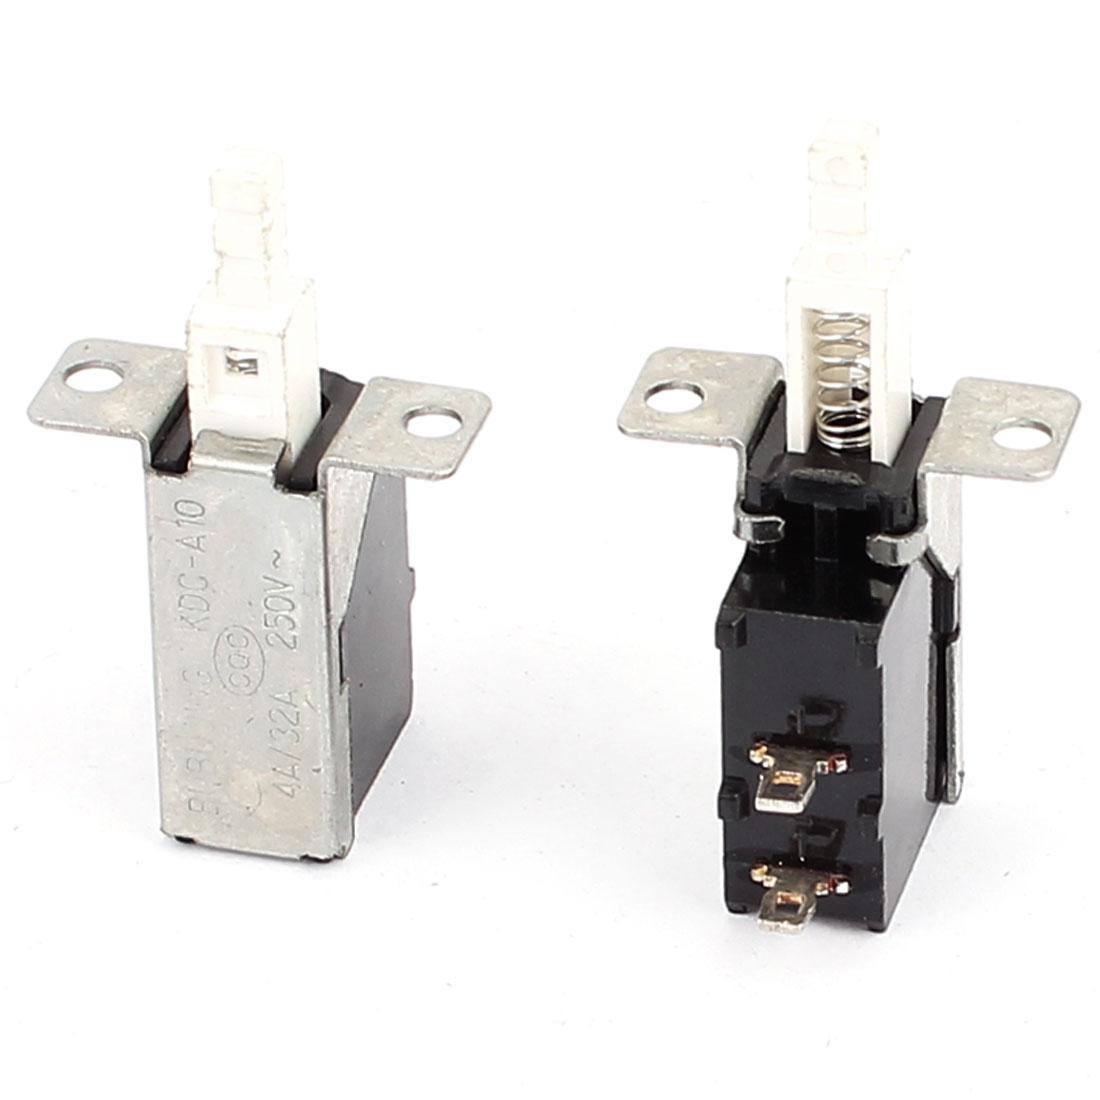 2PCS AC 250V 8A/32A Electric Self Locking SPST Push Button Power Switch